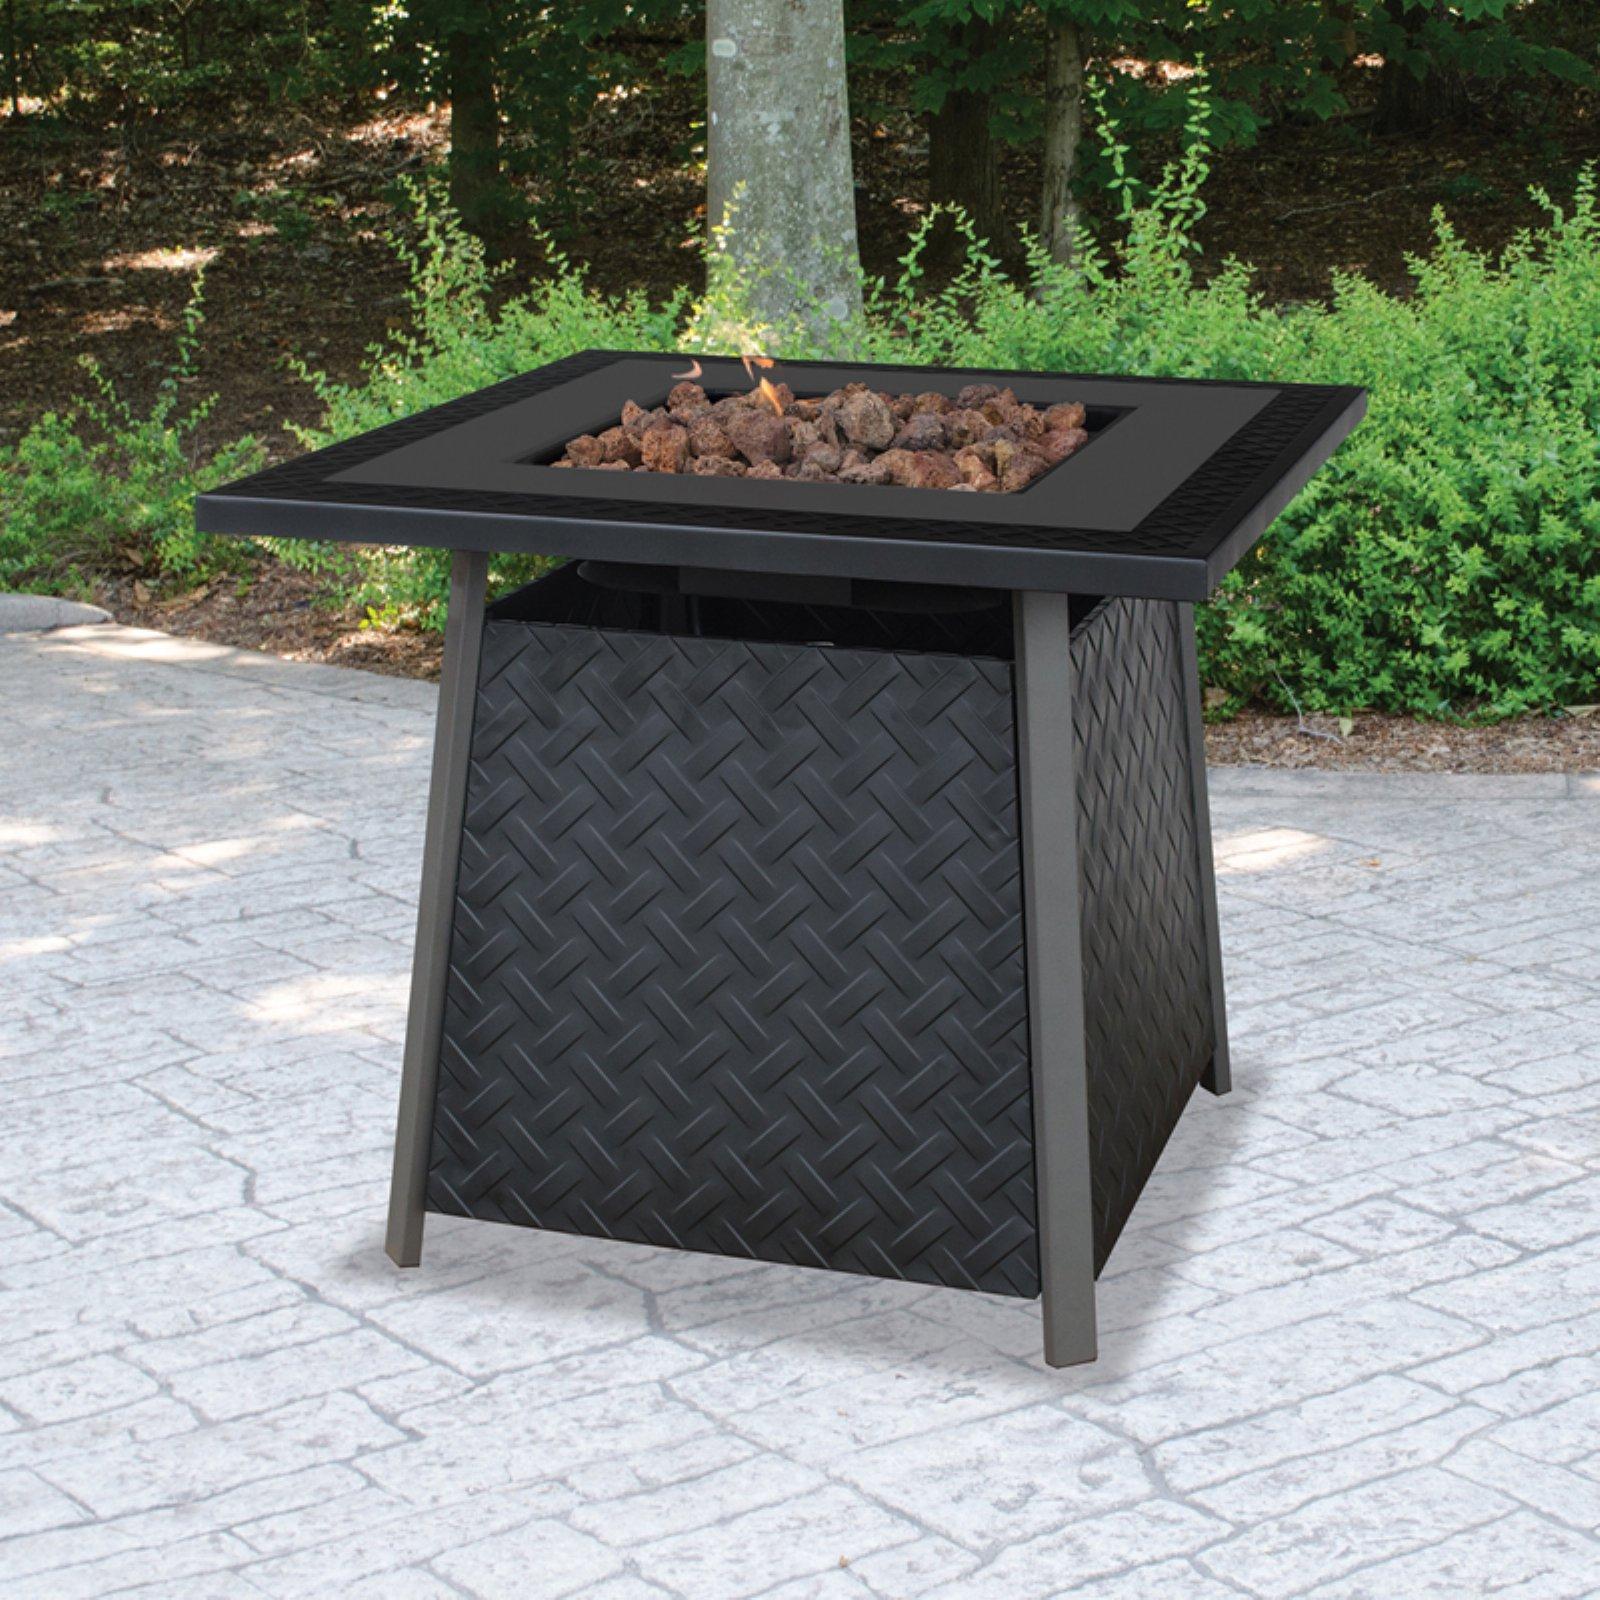 uniflame lp gas slate finish fire pit table - walmart